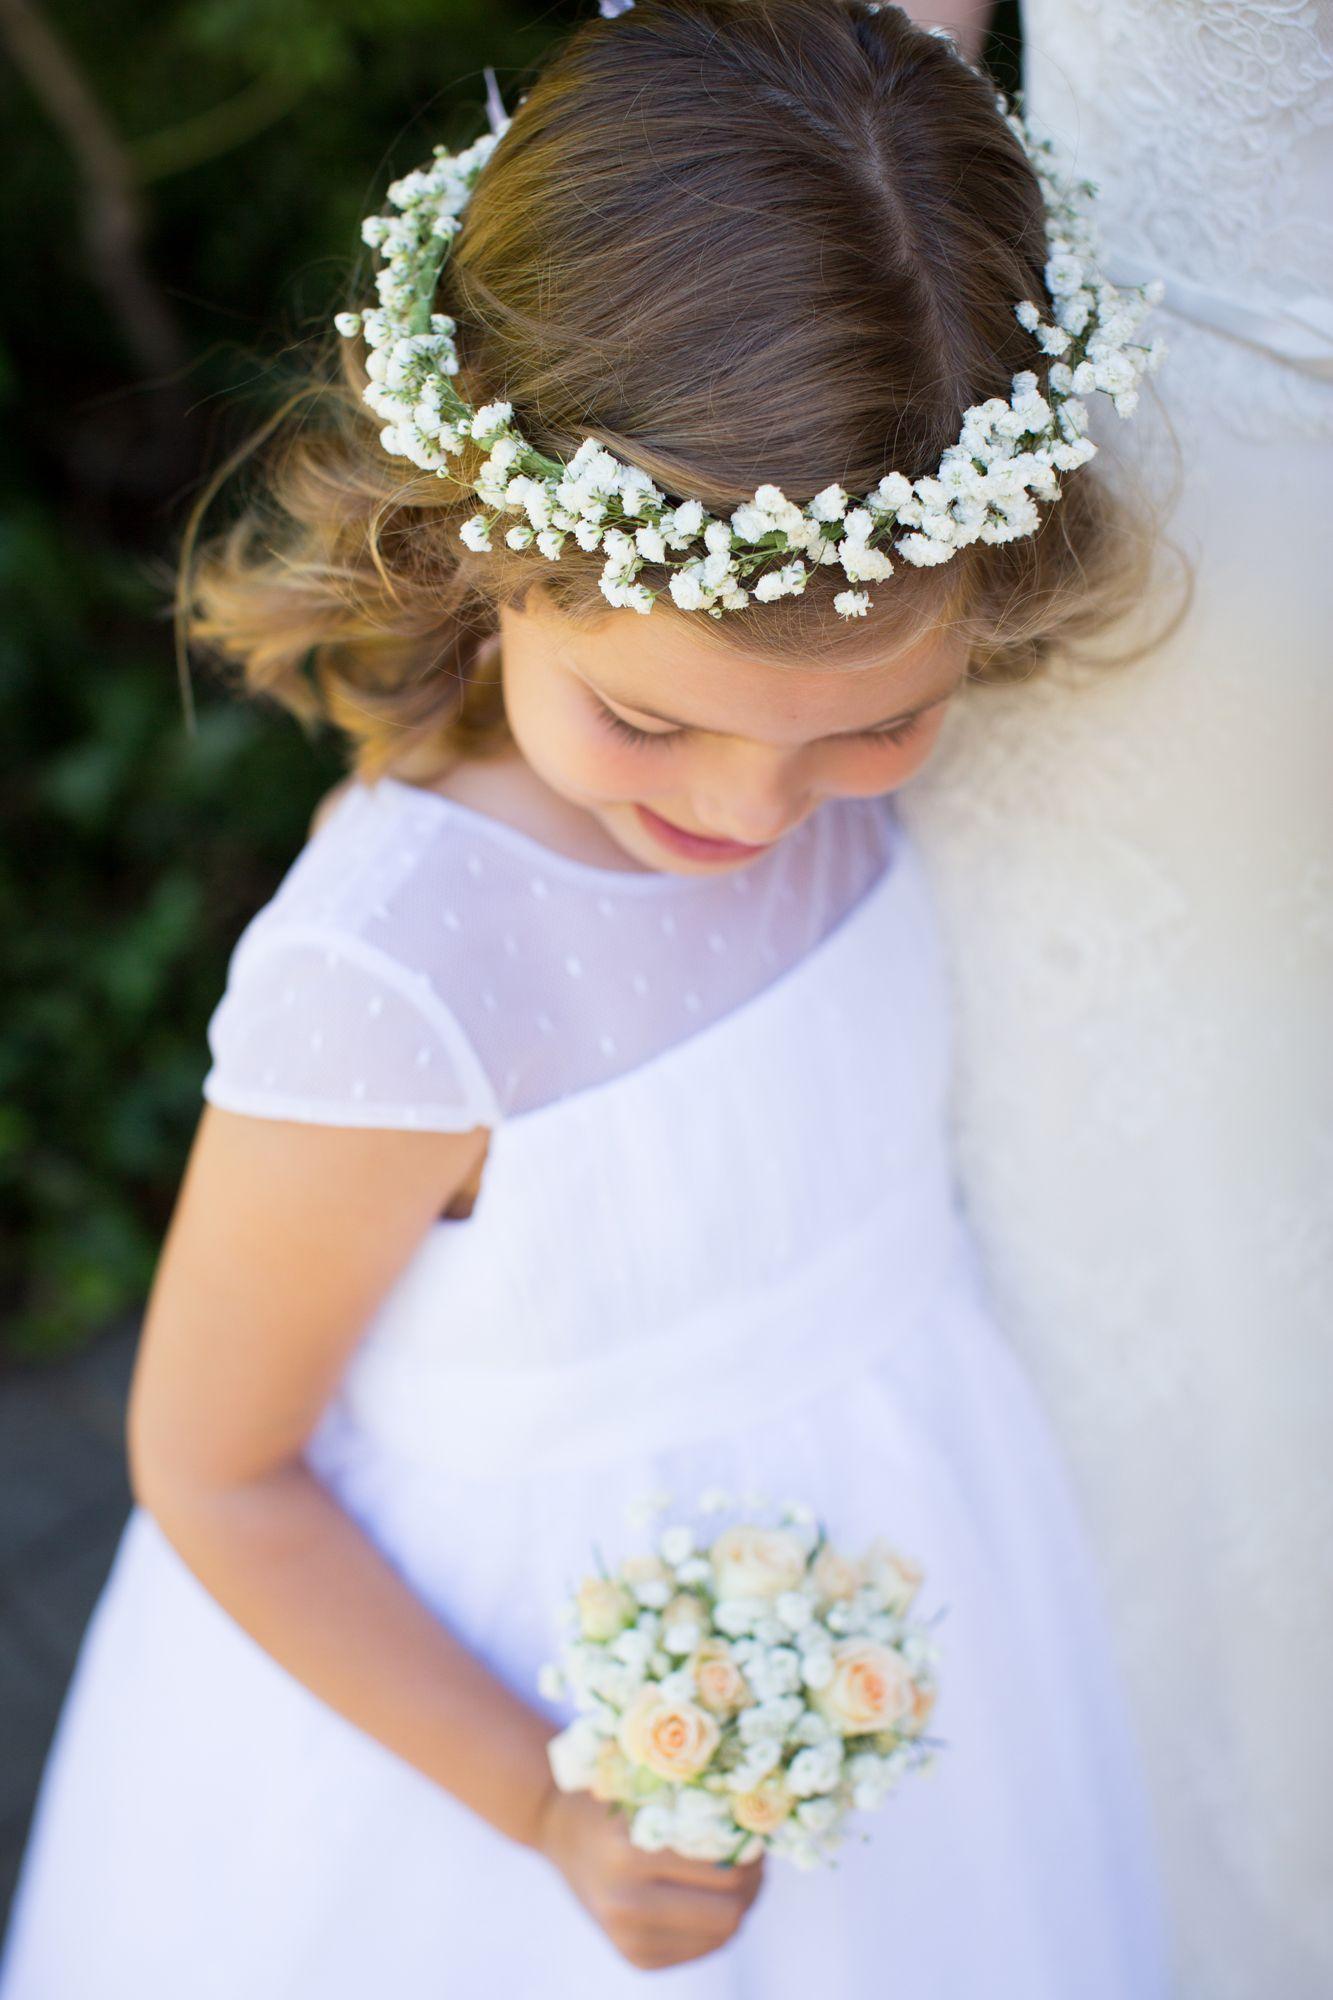 The Cutest Little Flower Girl Love Her Babys Breath Flower Crown